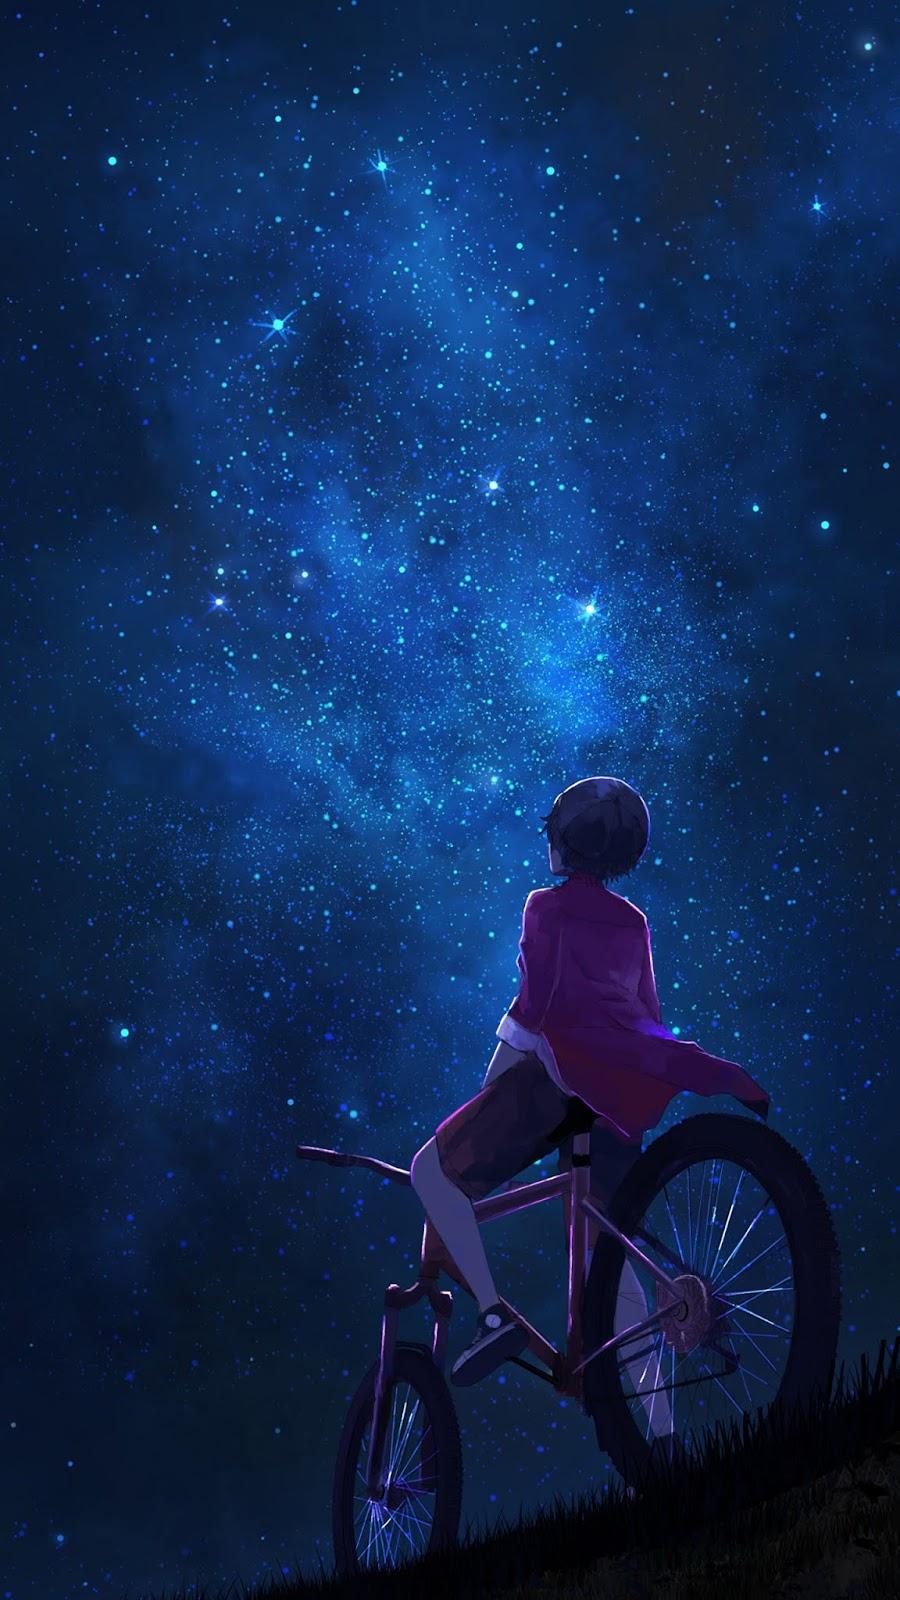 Watching the starry night